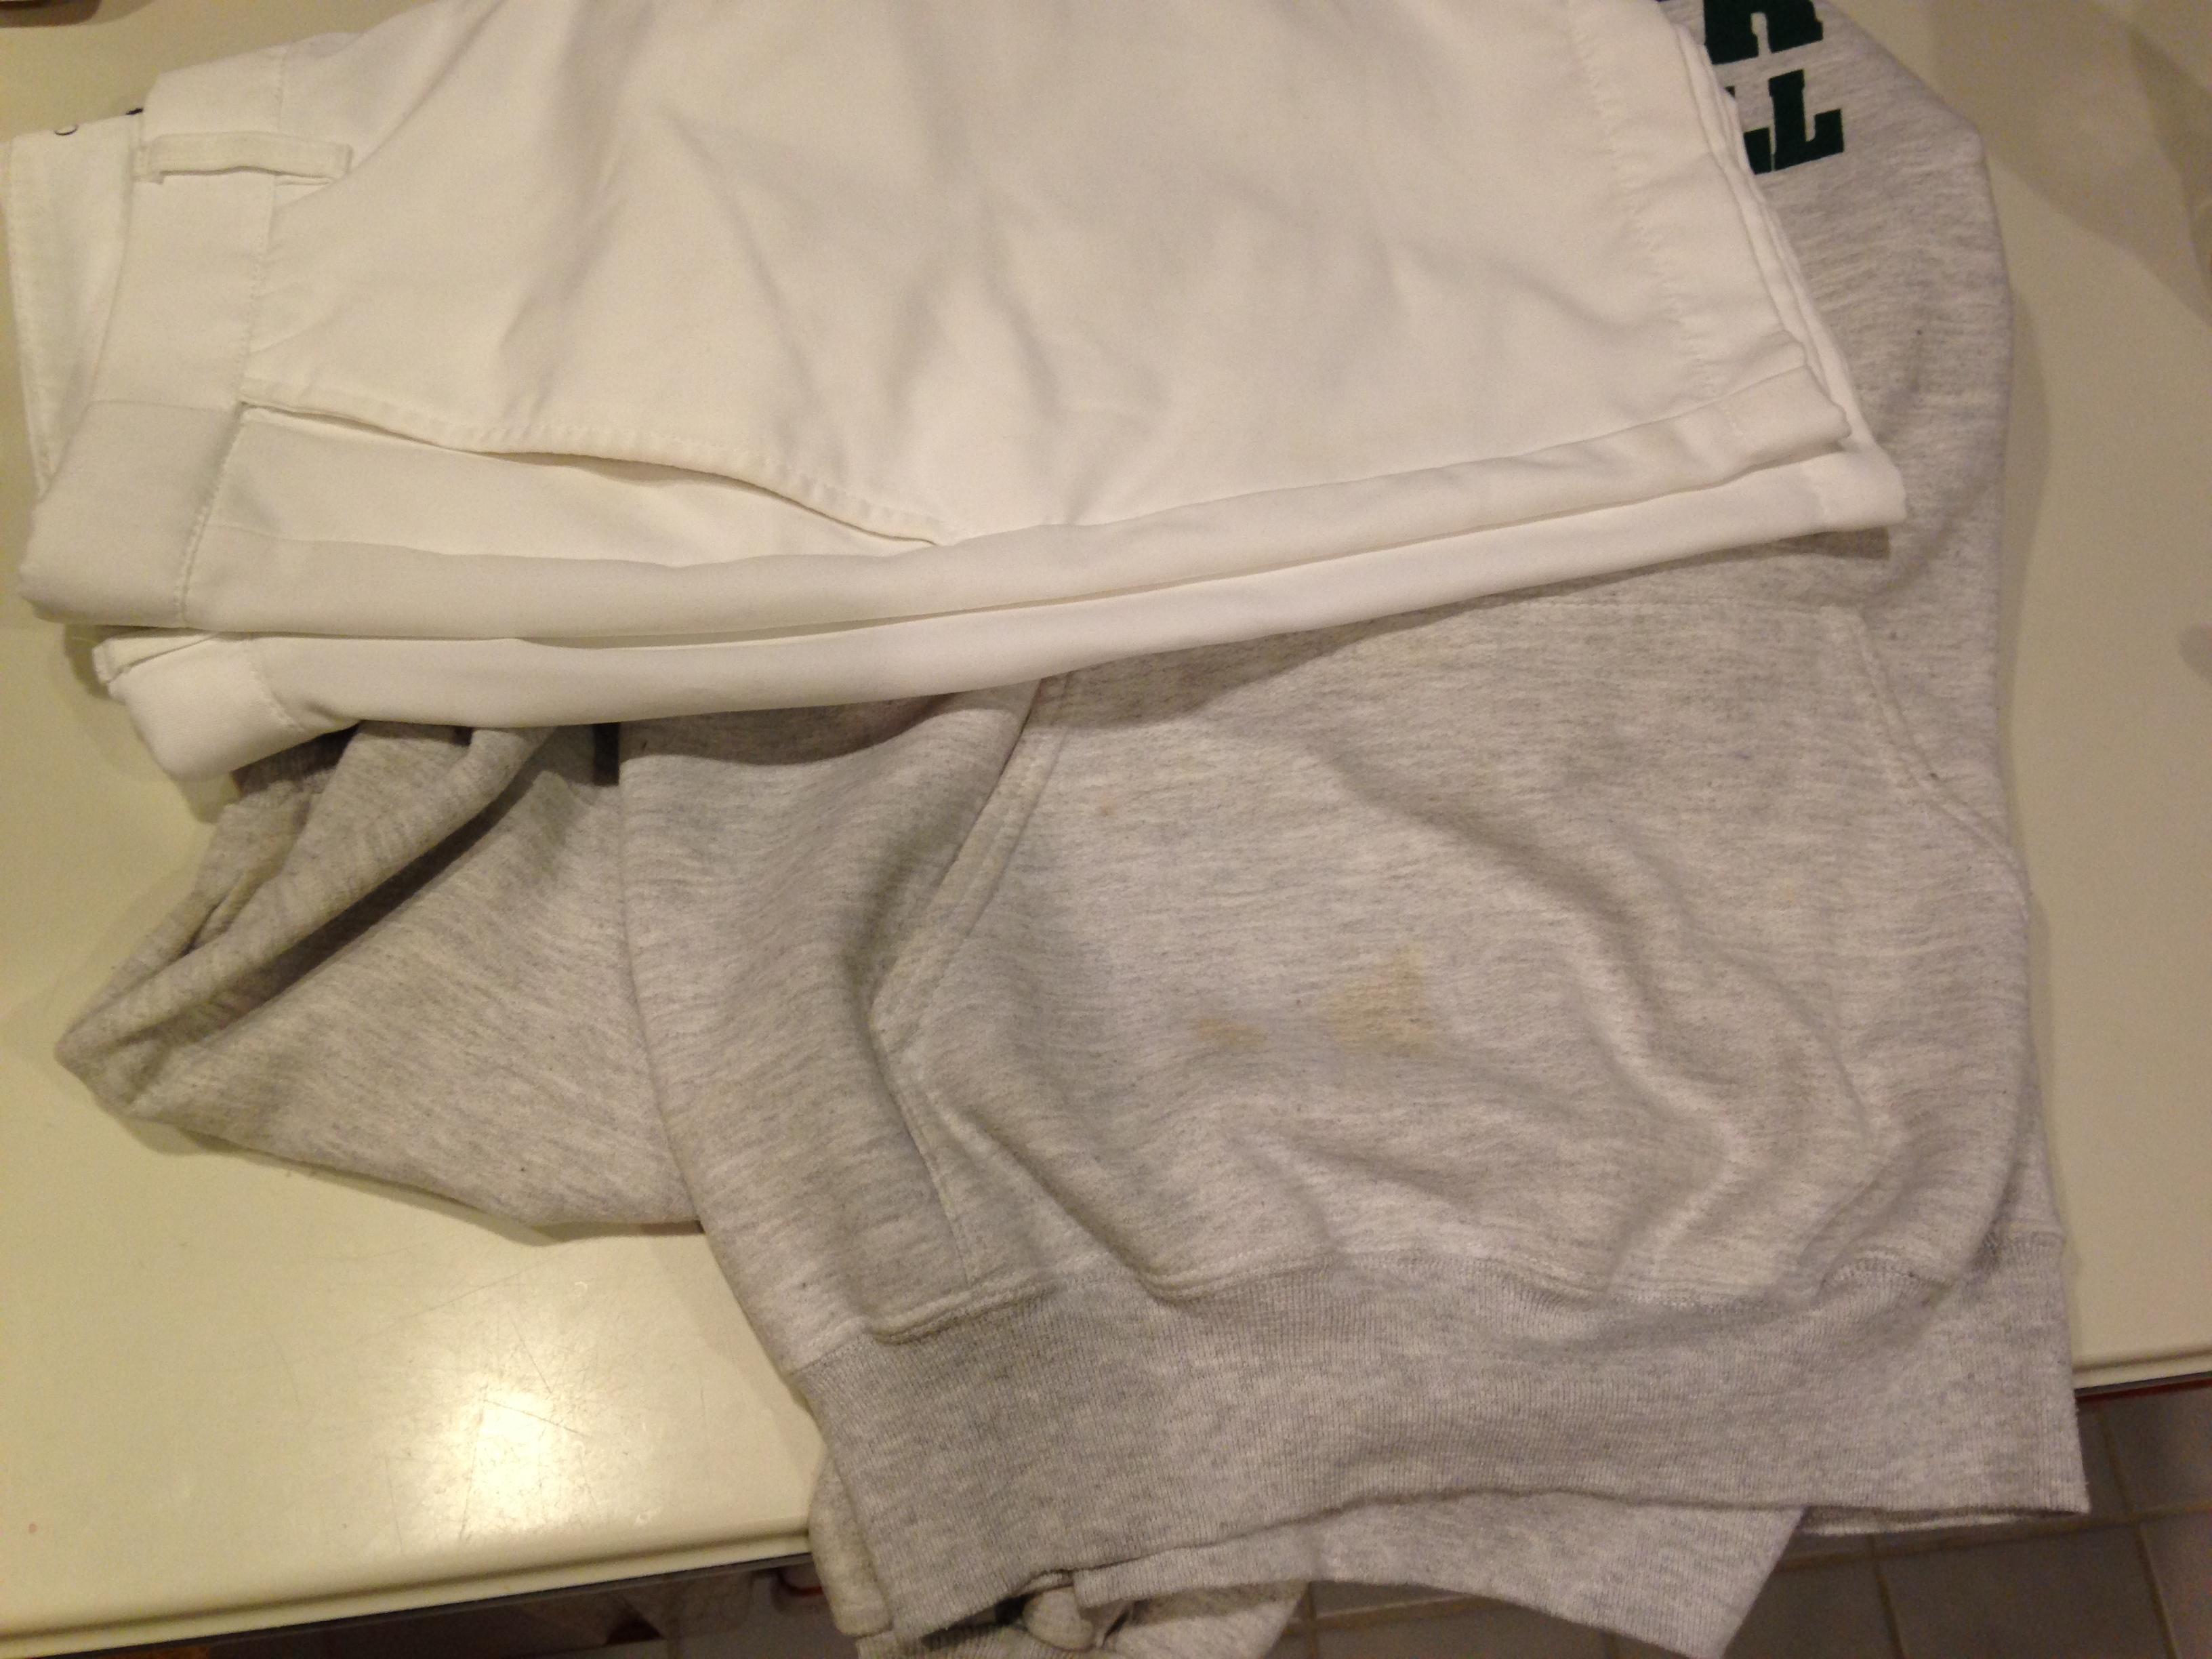 Purex Fels-Naptha Laundry Bar FREE Giveaway!